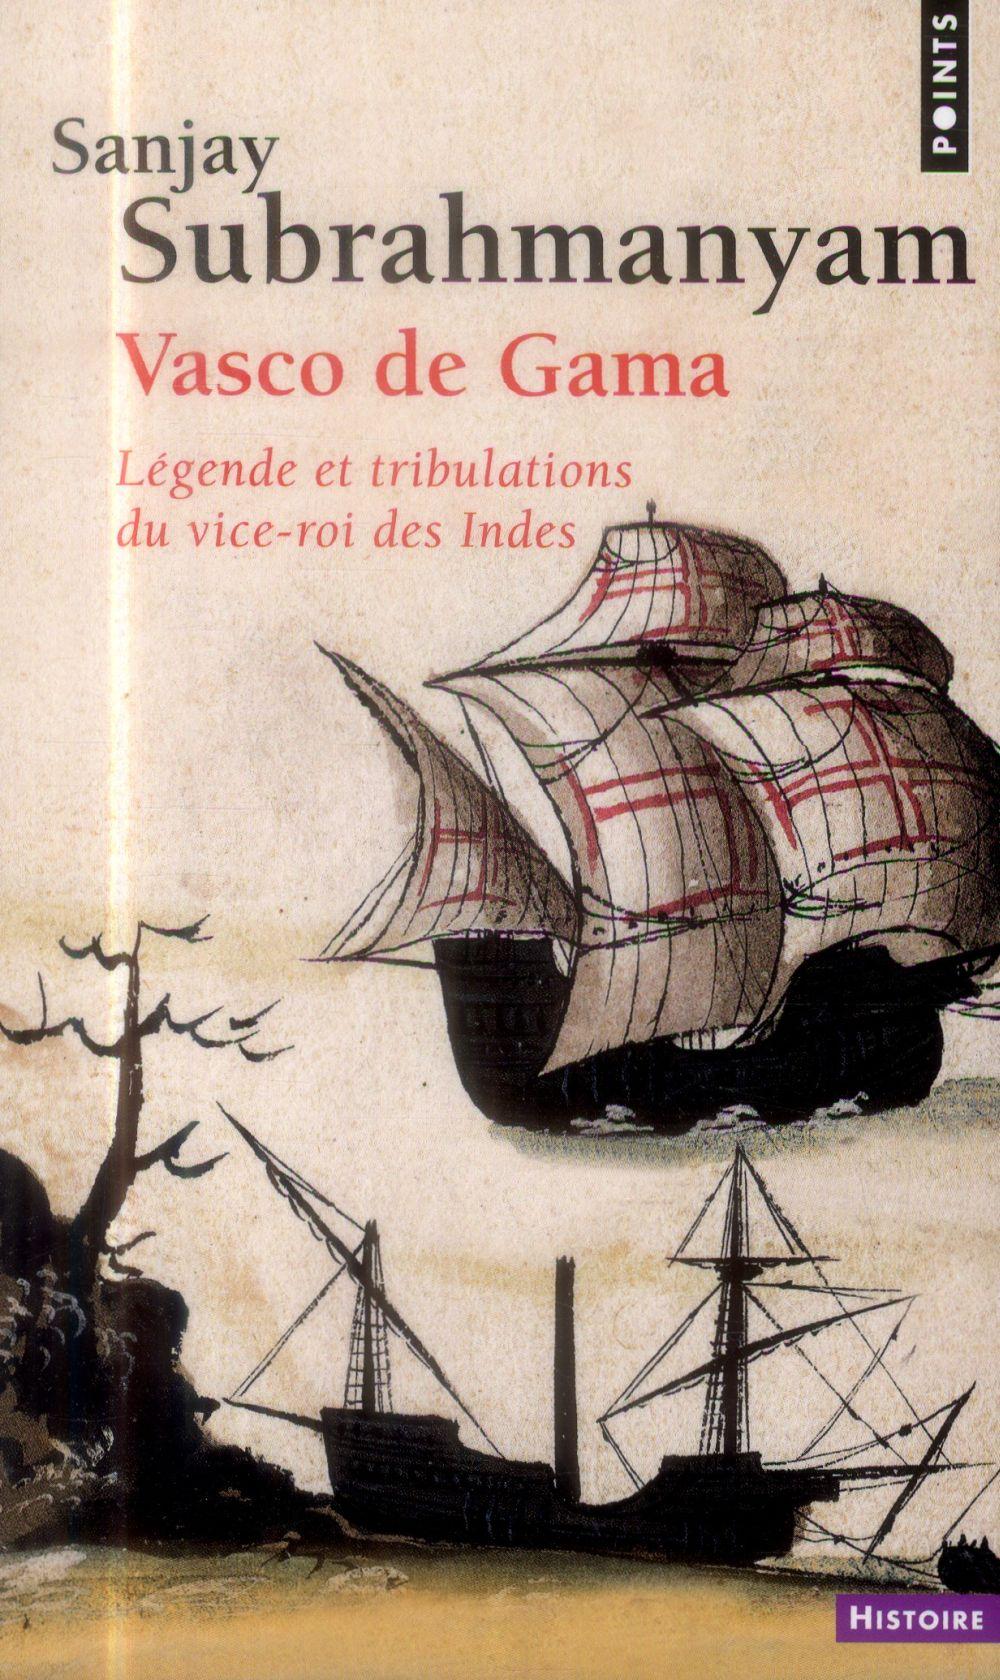 VASCO DE GAMA  -  LEGENDE ET TRIBULATIONS DU VICE-ROI DES INDES